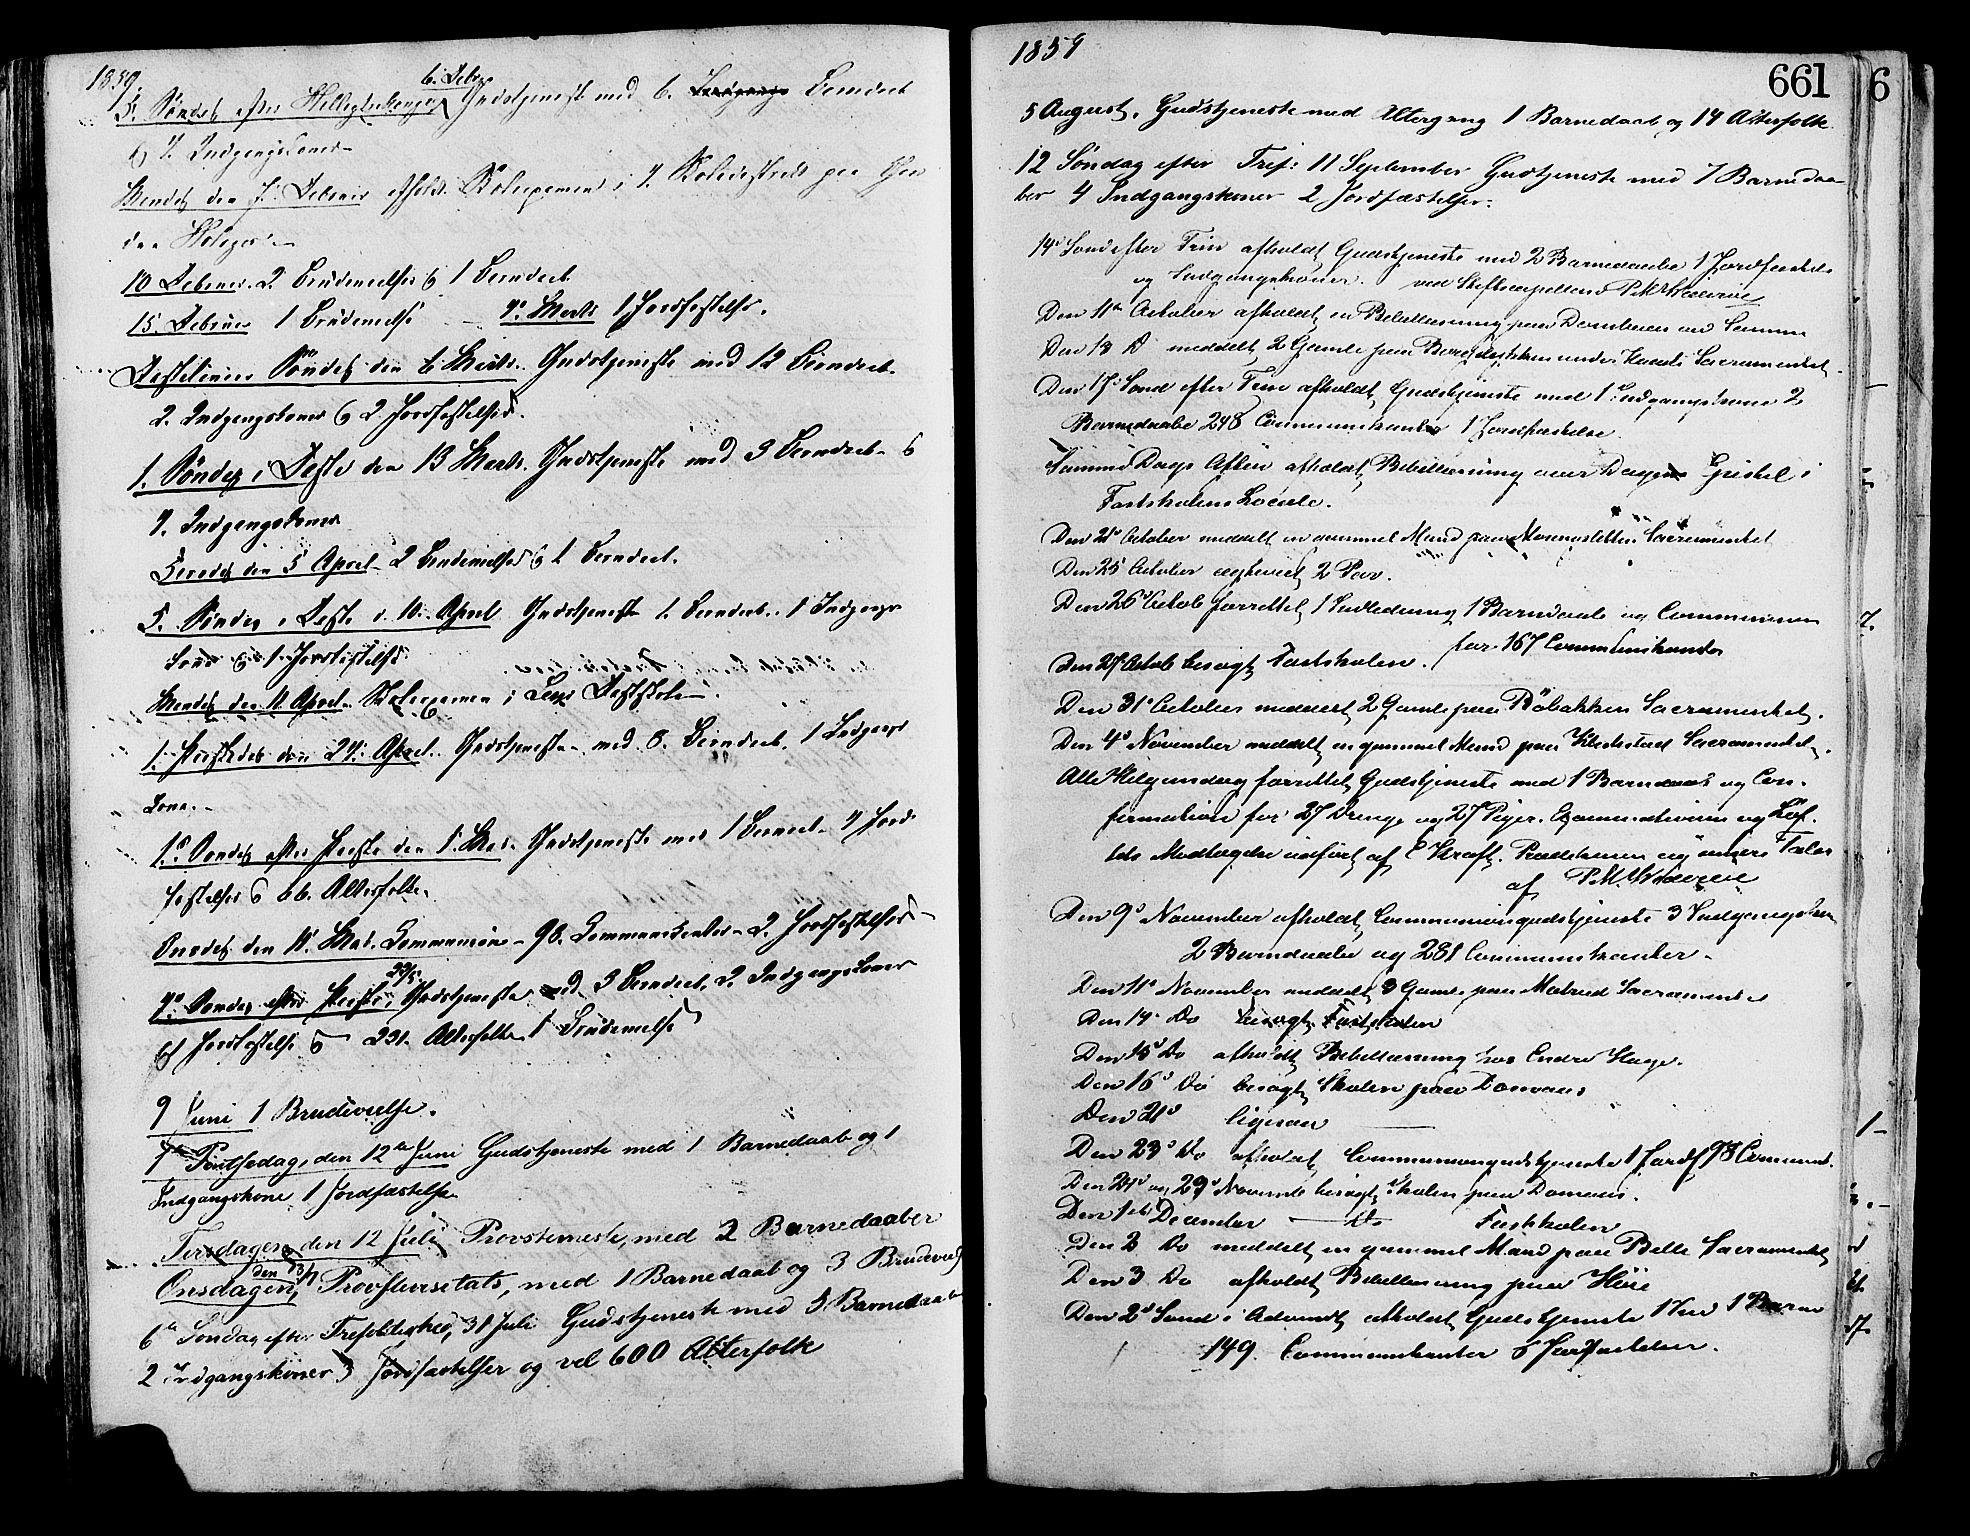 SAH, Lesja prestekontor, Ministerialbok nr. 8, 1854-1880, s. 661